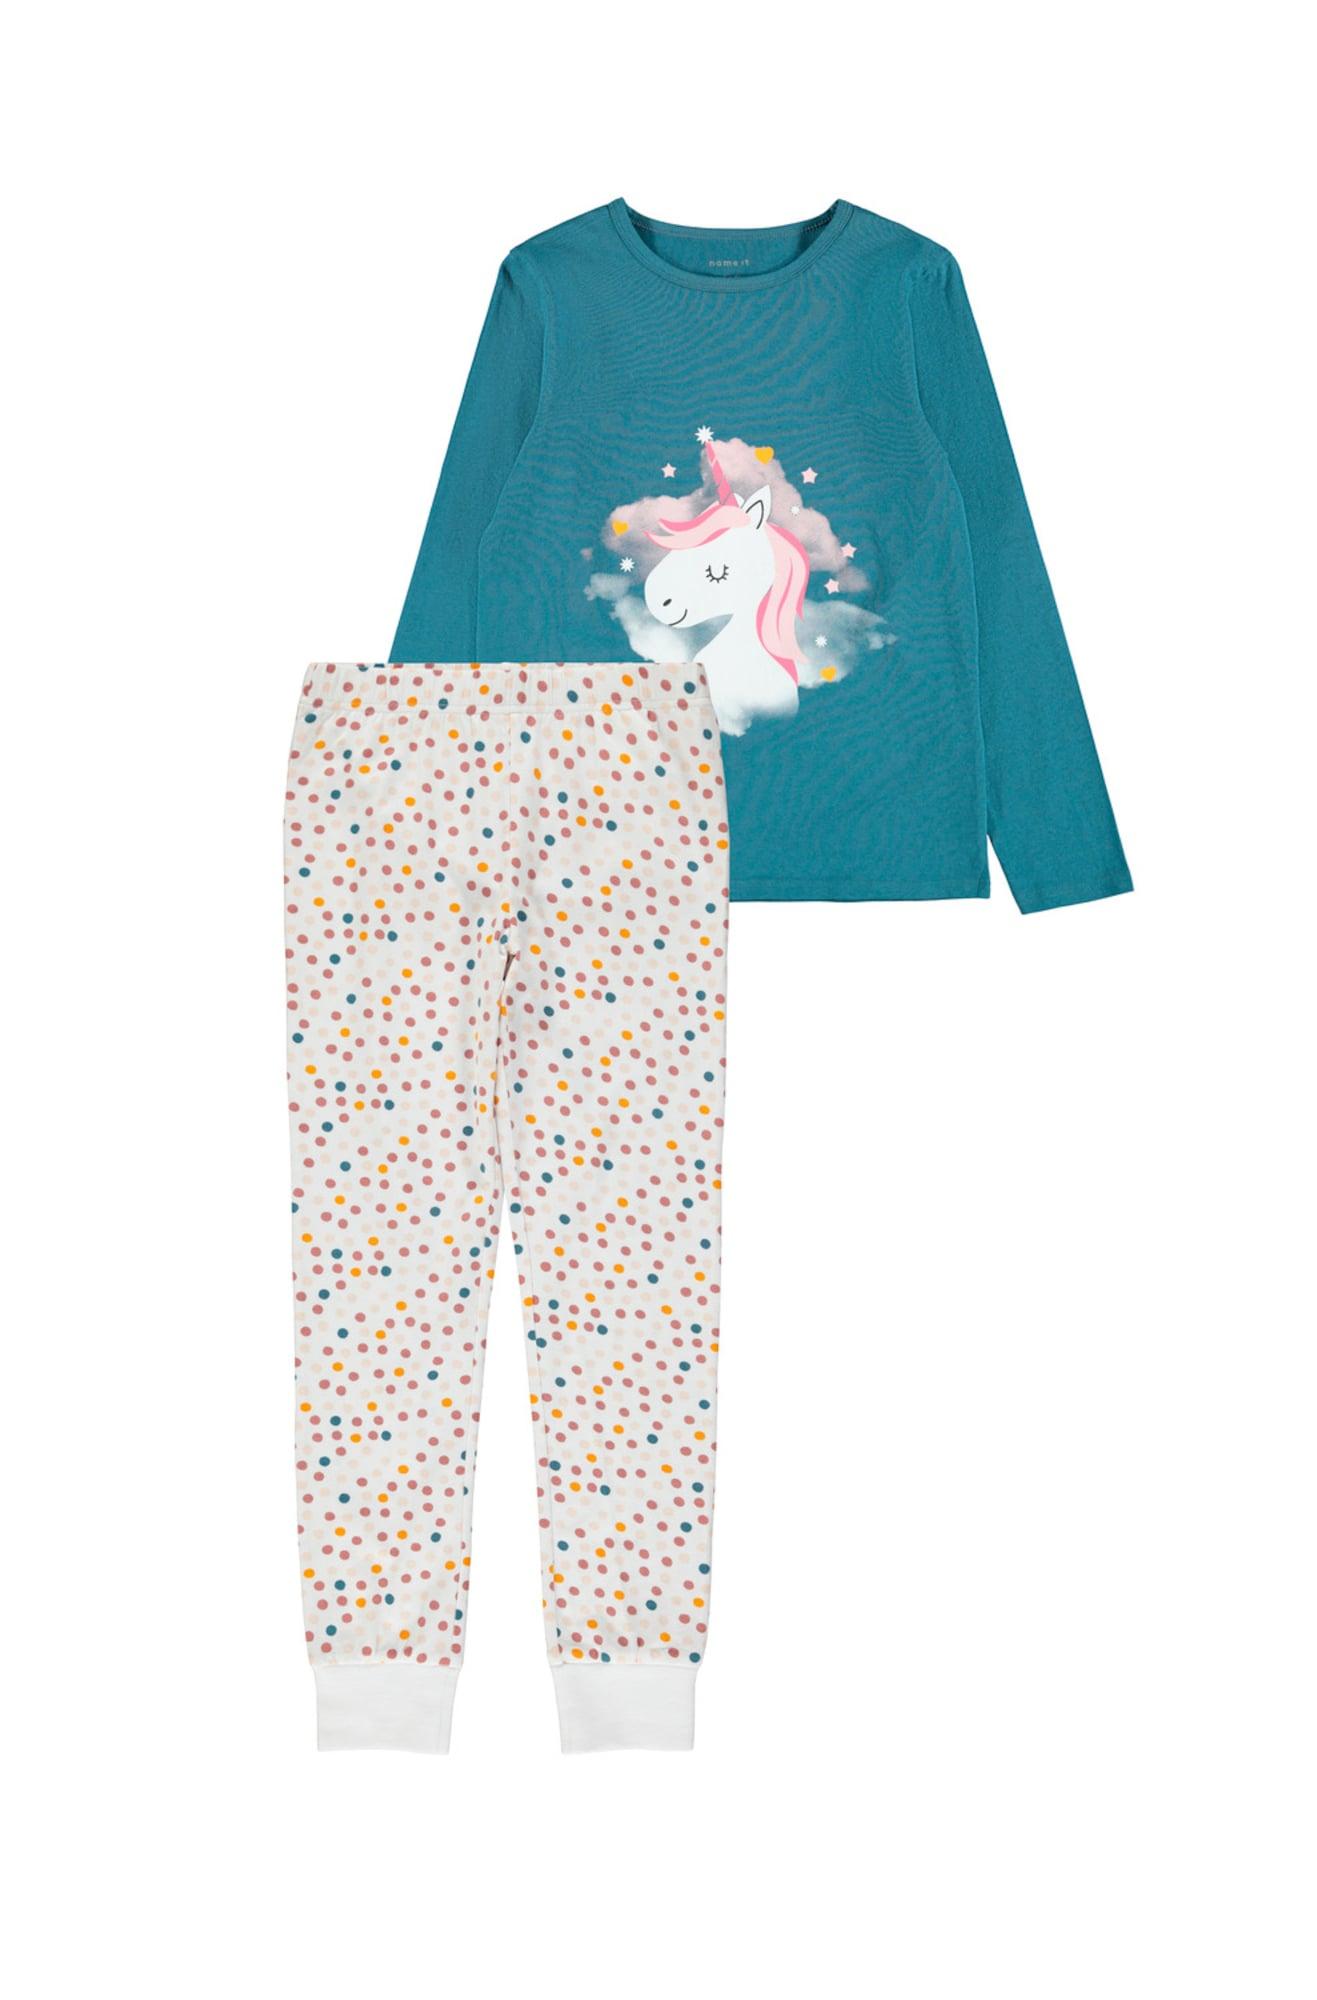 NAME IT Miego kostiumas 'UNICORN' mėlyna dūmų spalva / šampano / rožių spalva / geltona / vilnos balta